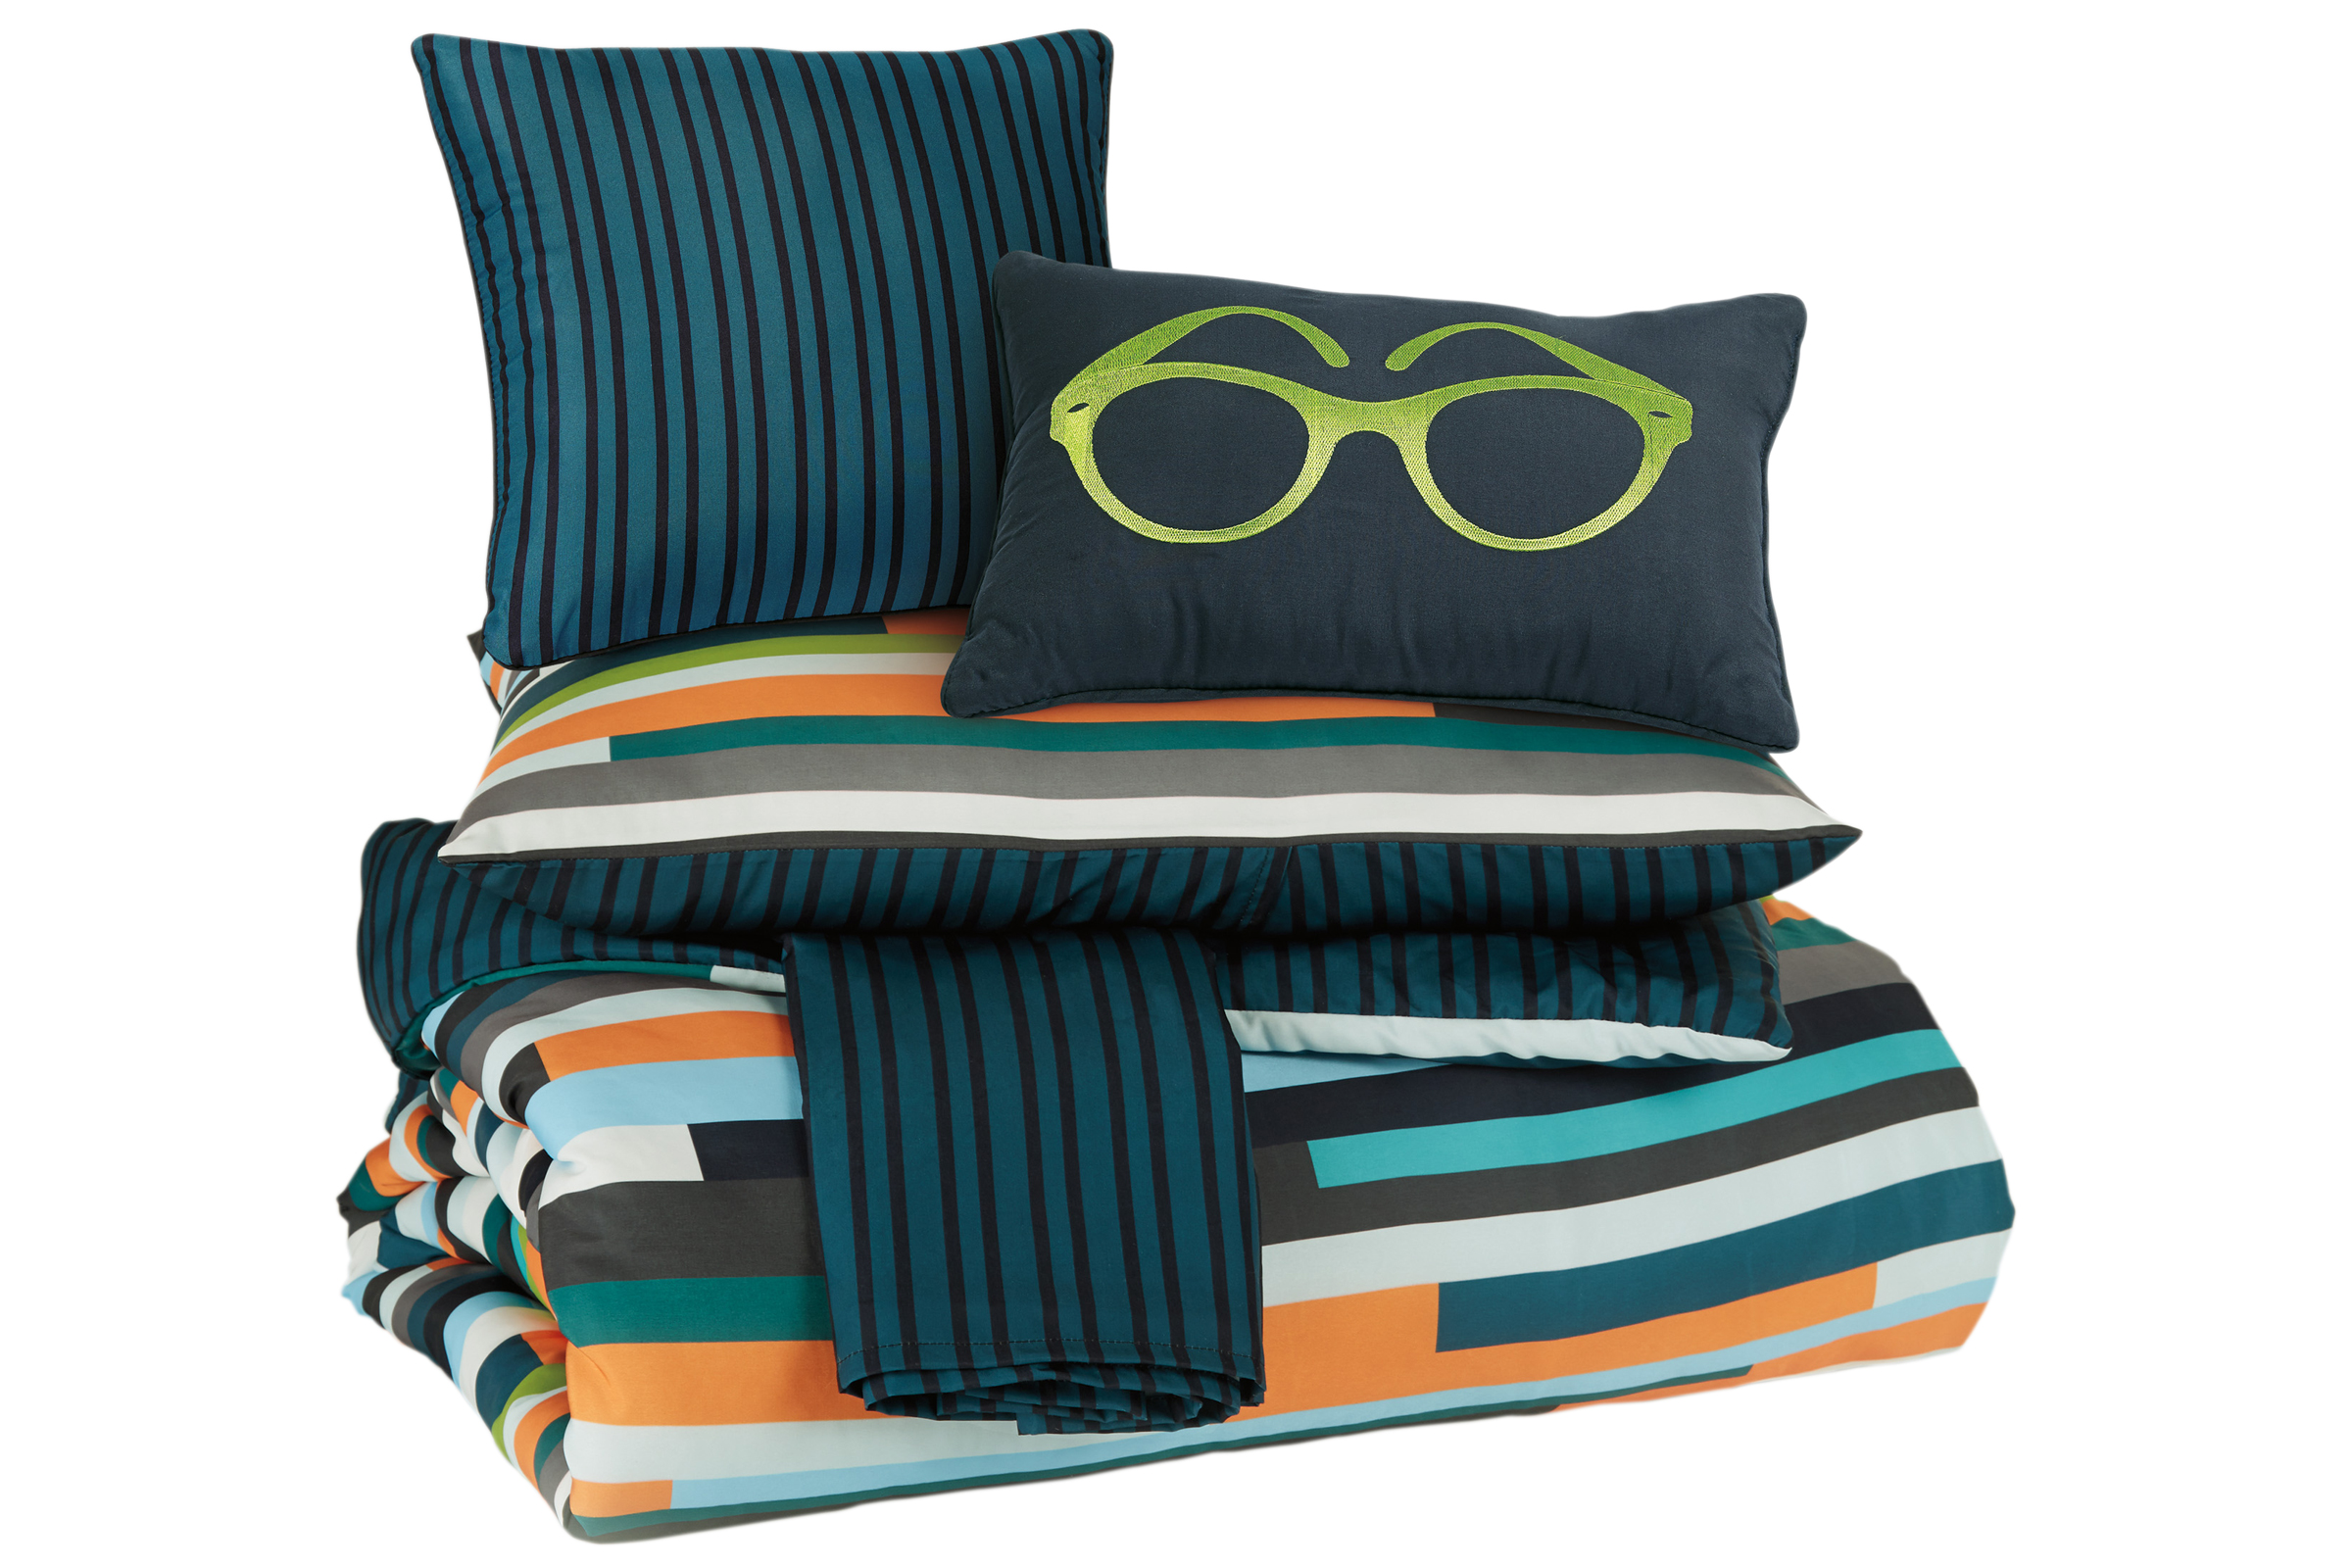 Seventy Twin Comforter Set In Multi By Ashley At Gardner White